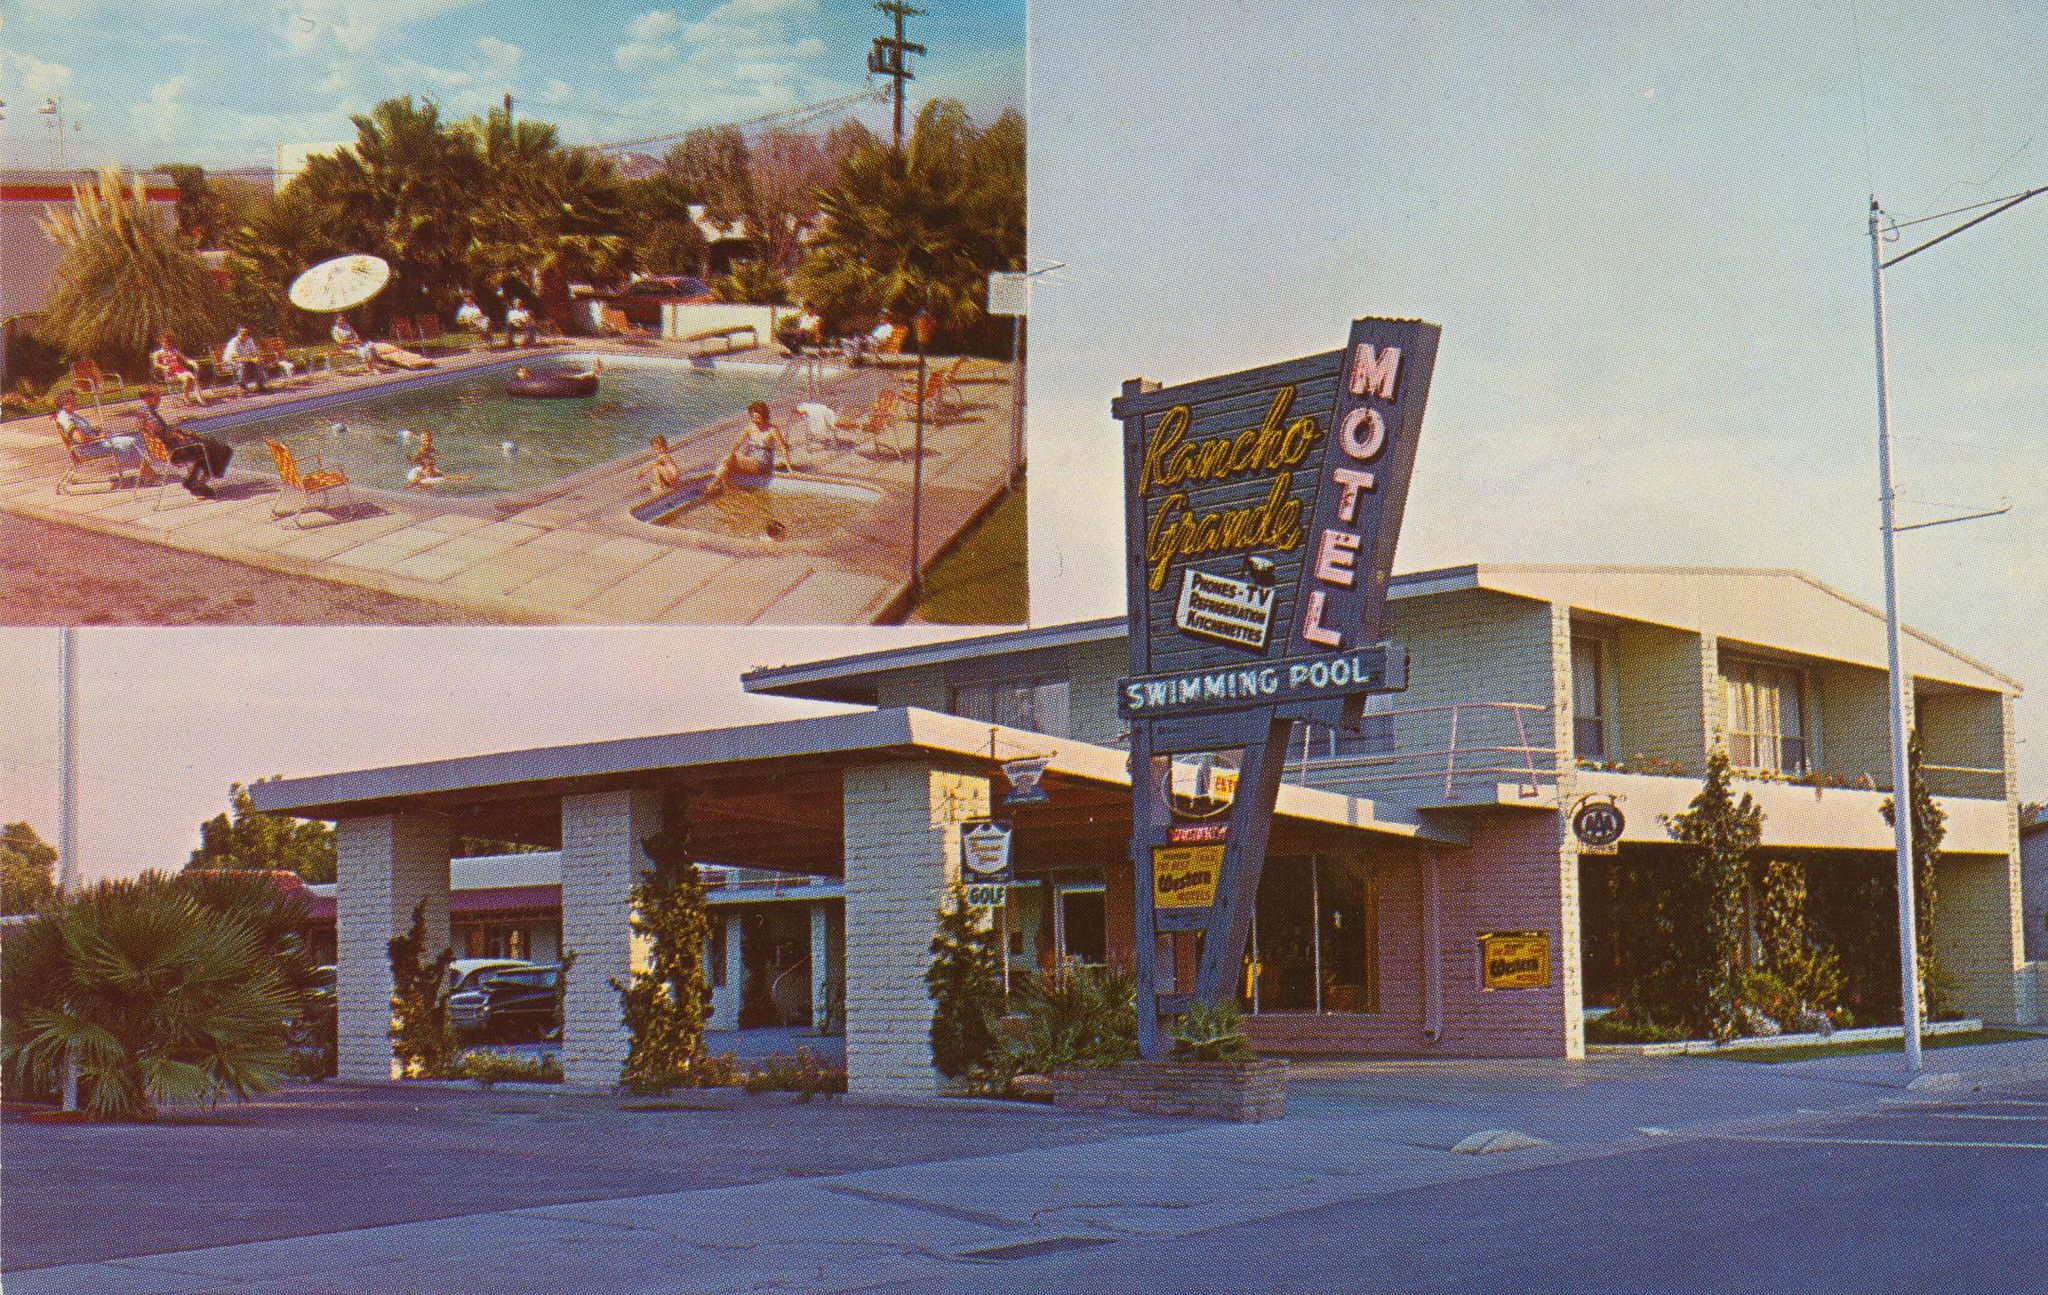 Https Flic Kr P Ejgmy5 Rancho Grande Motor Hotel Wickenburg Arizona Downtown Convenient To Restaurants And S Heated Swimming Pool Telephones